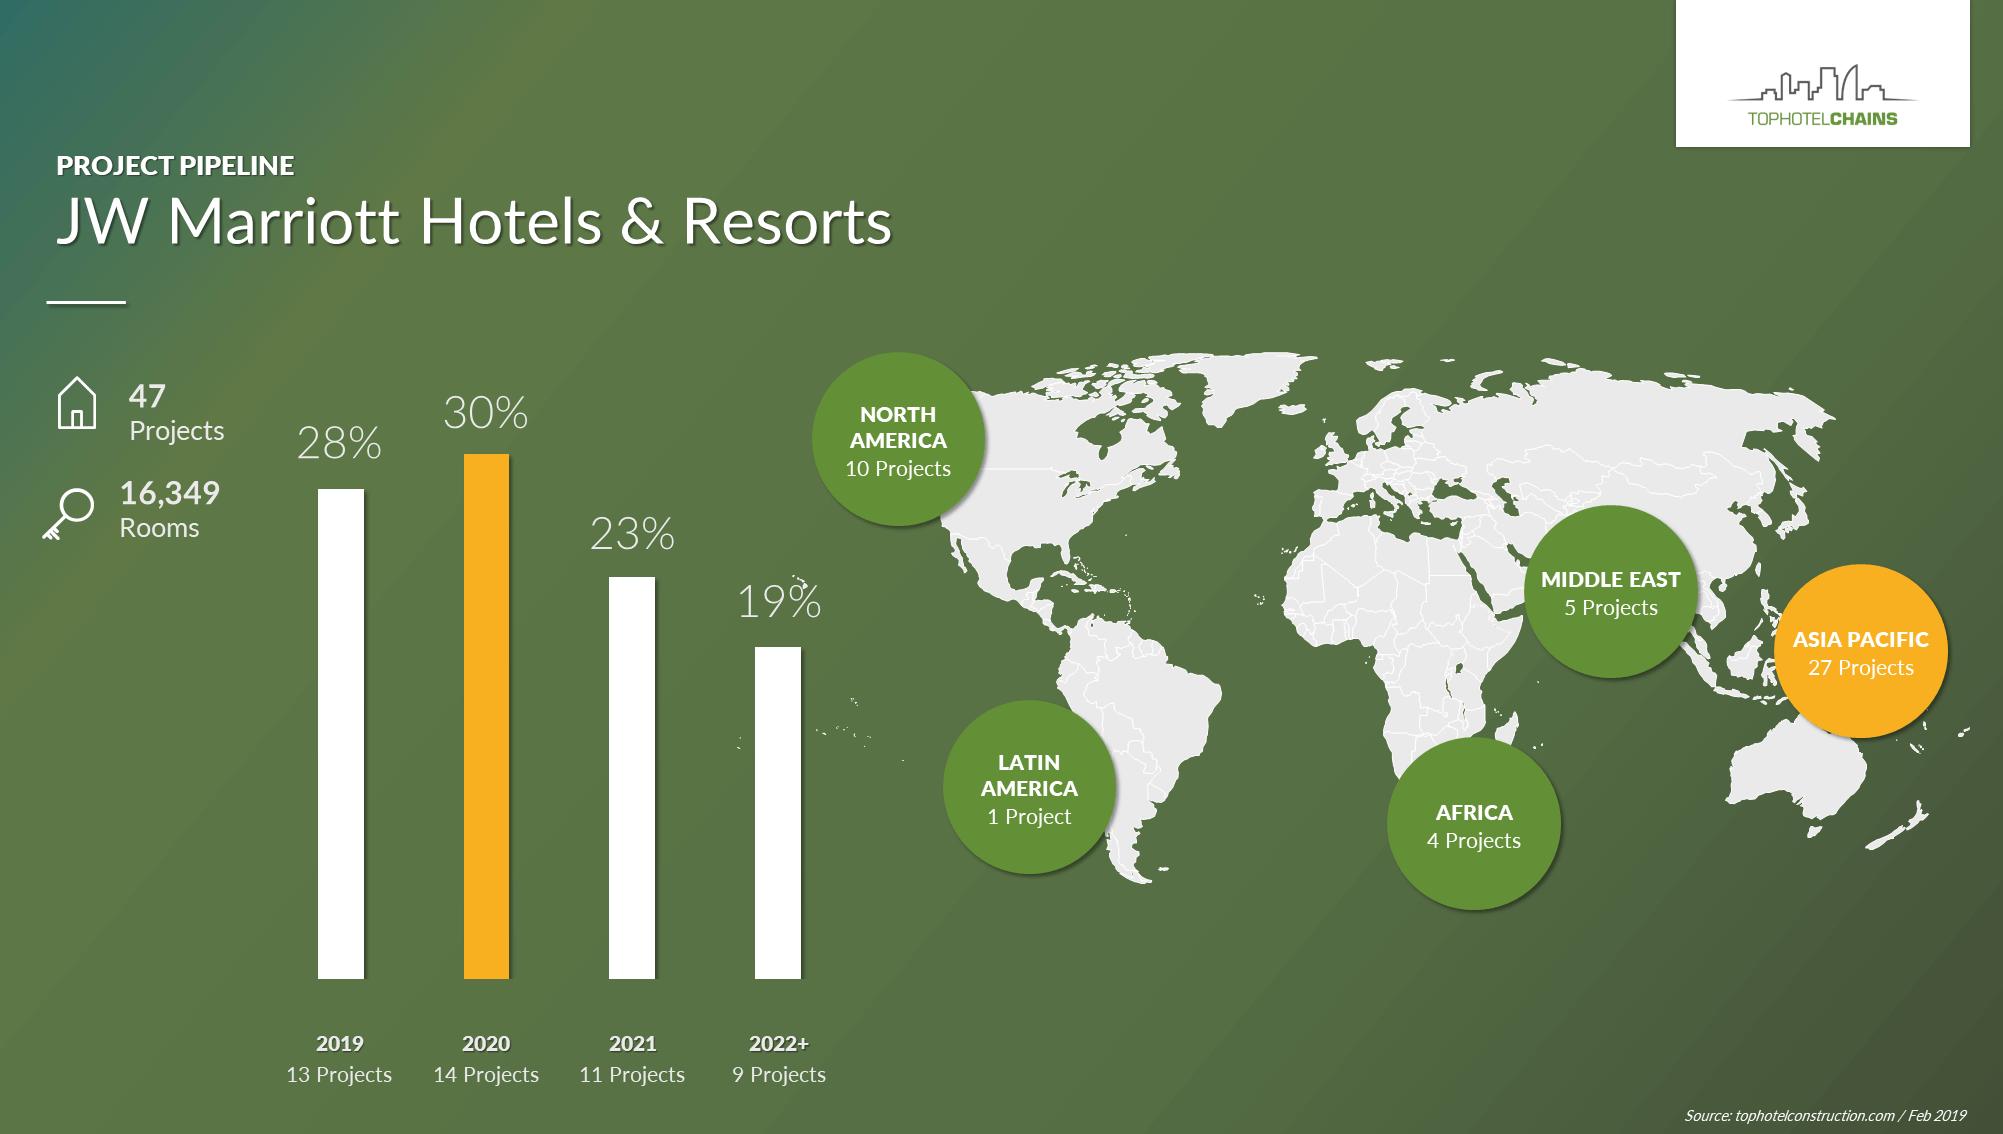 JW Marriott Hotels & Resorts